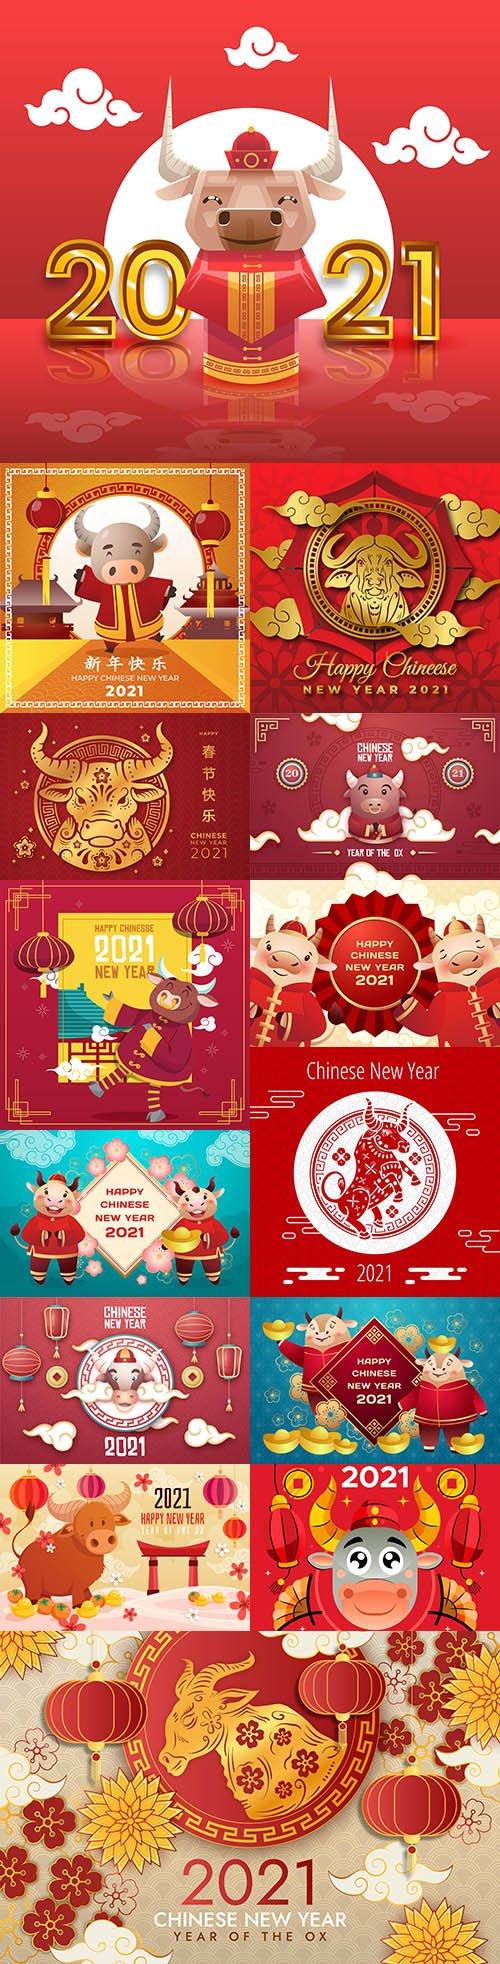 Chinese festive New Year 2021 symbol bull design 3